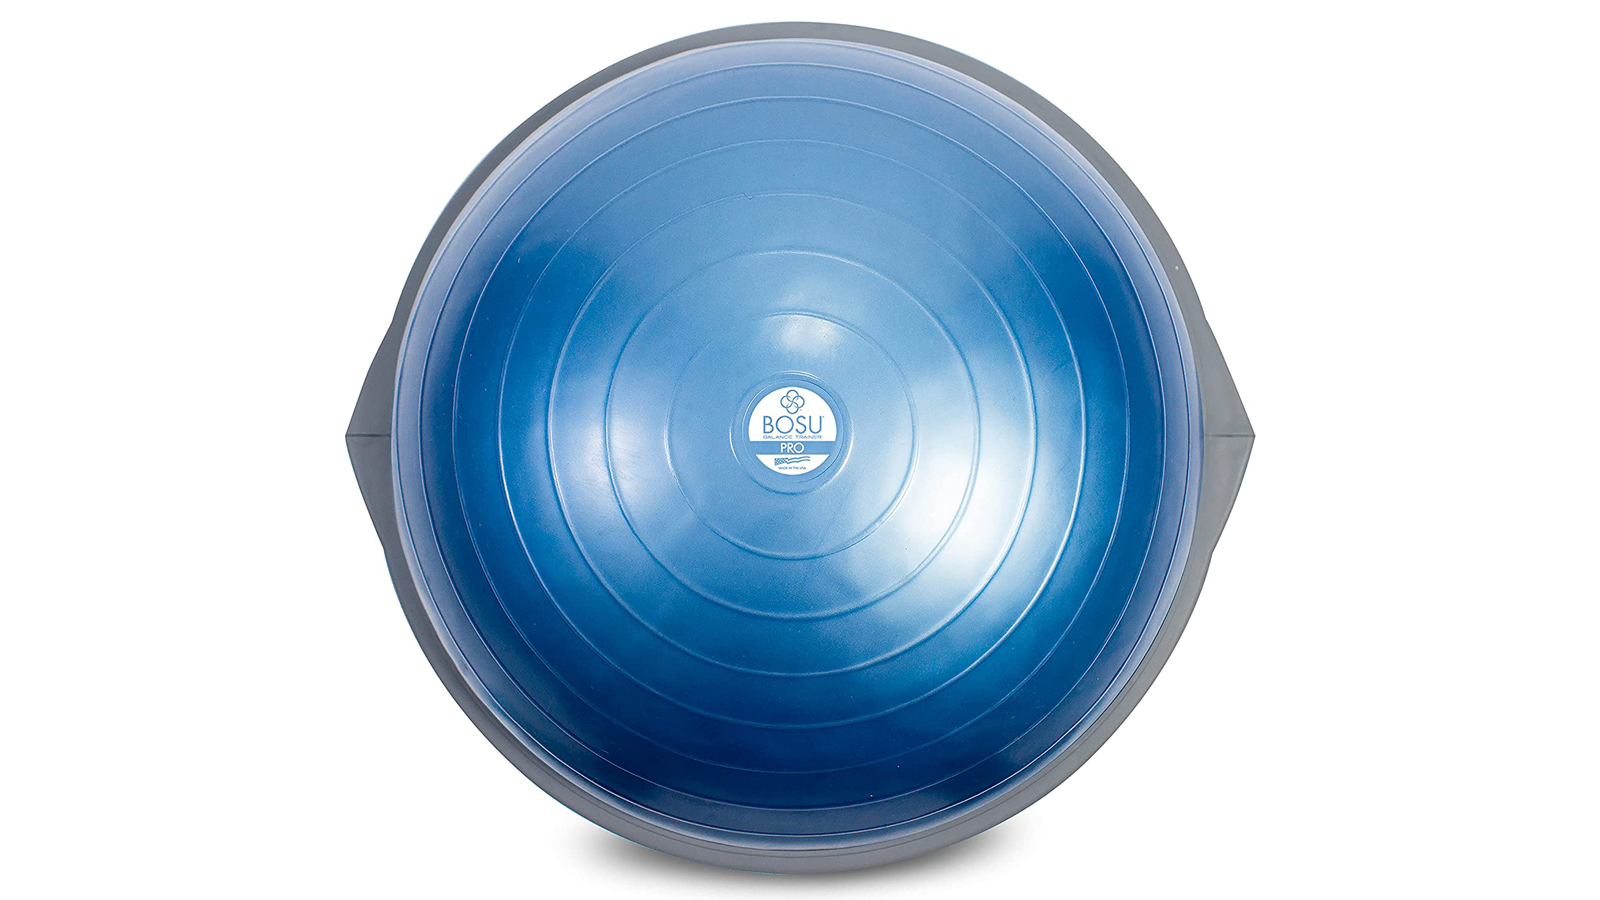 Top-down view of Bosu balance ball